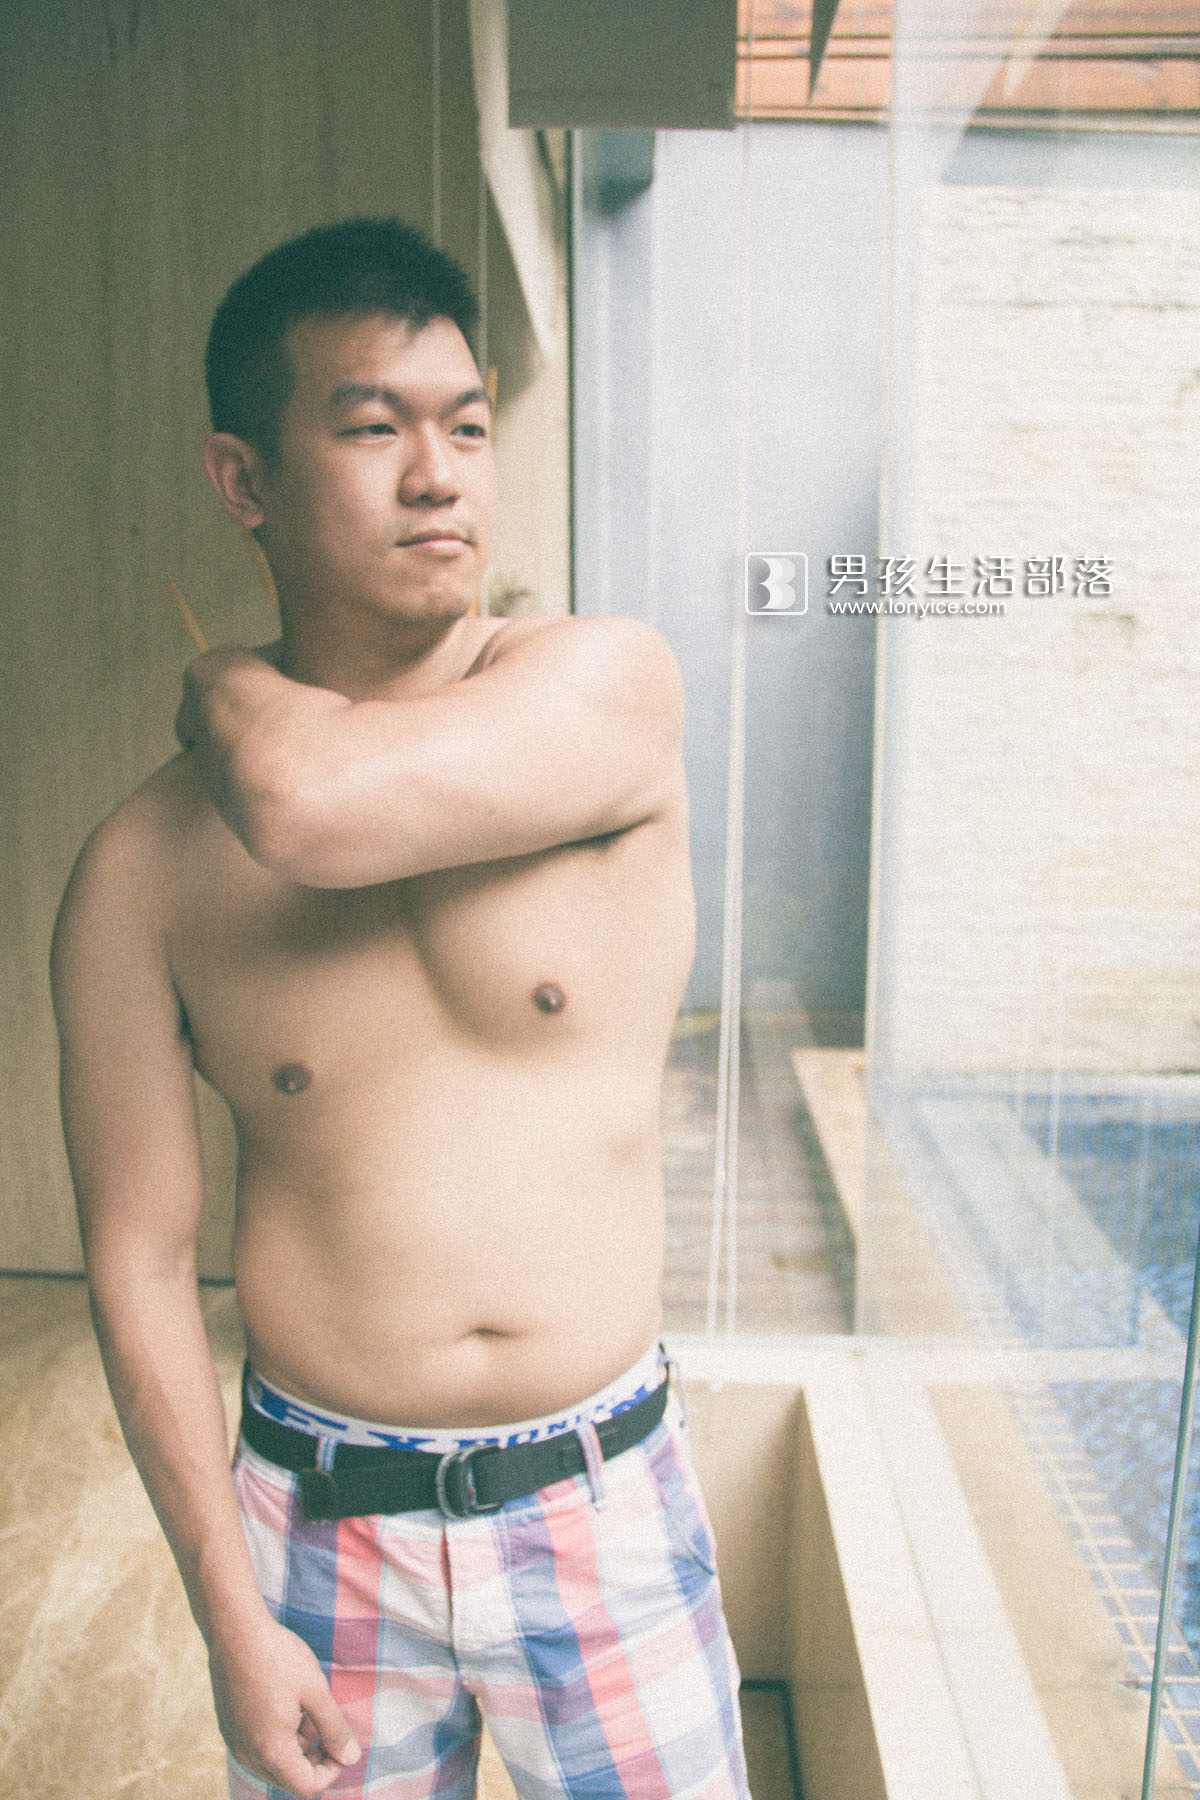 Poolside man #5